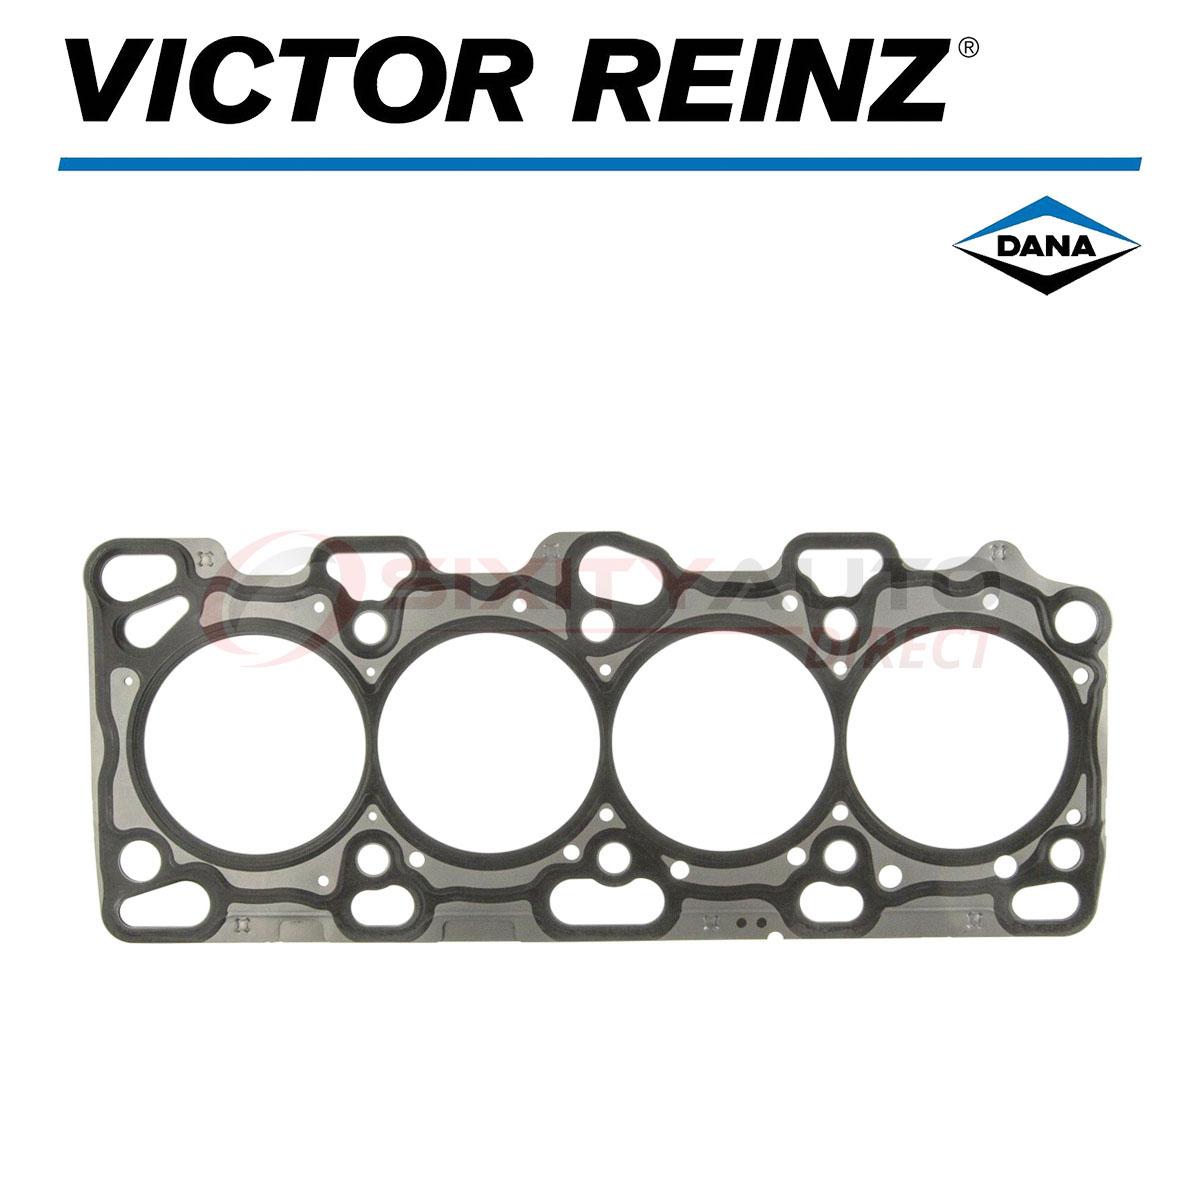 Victor Reinz Cylinder Head Gasket For Mitsubishi